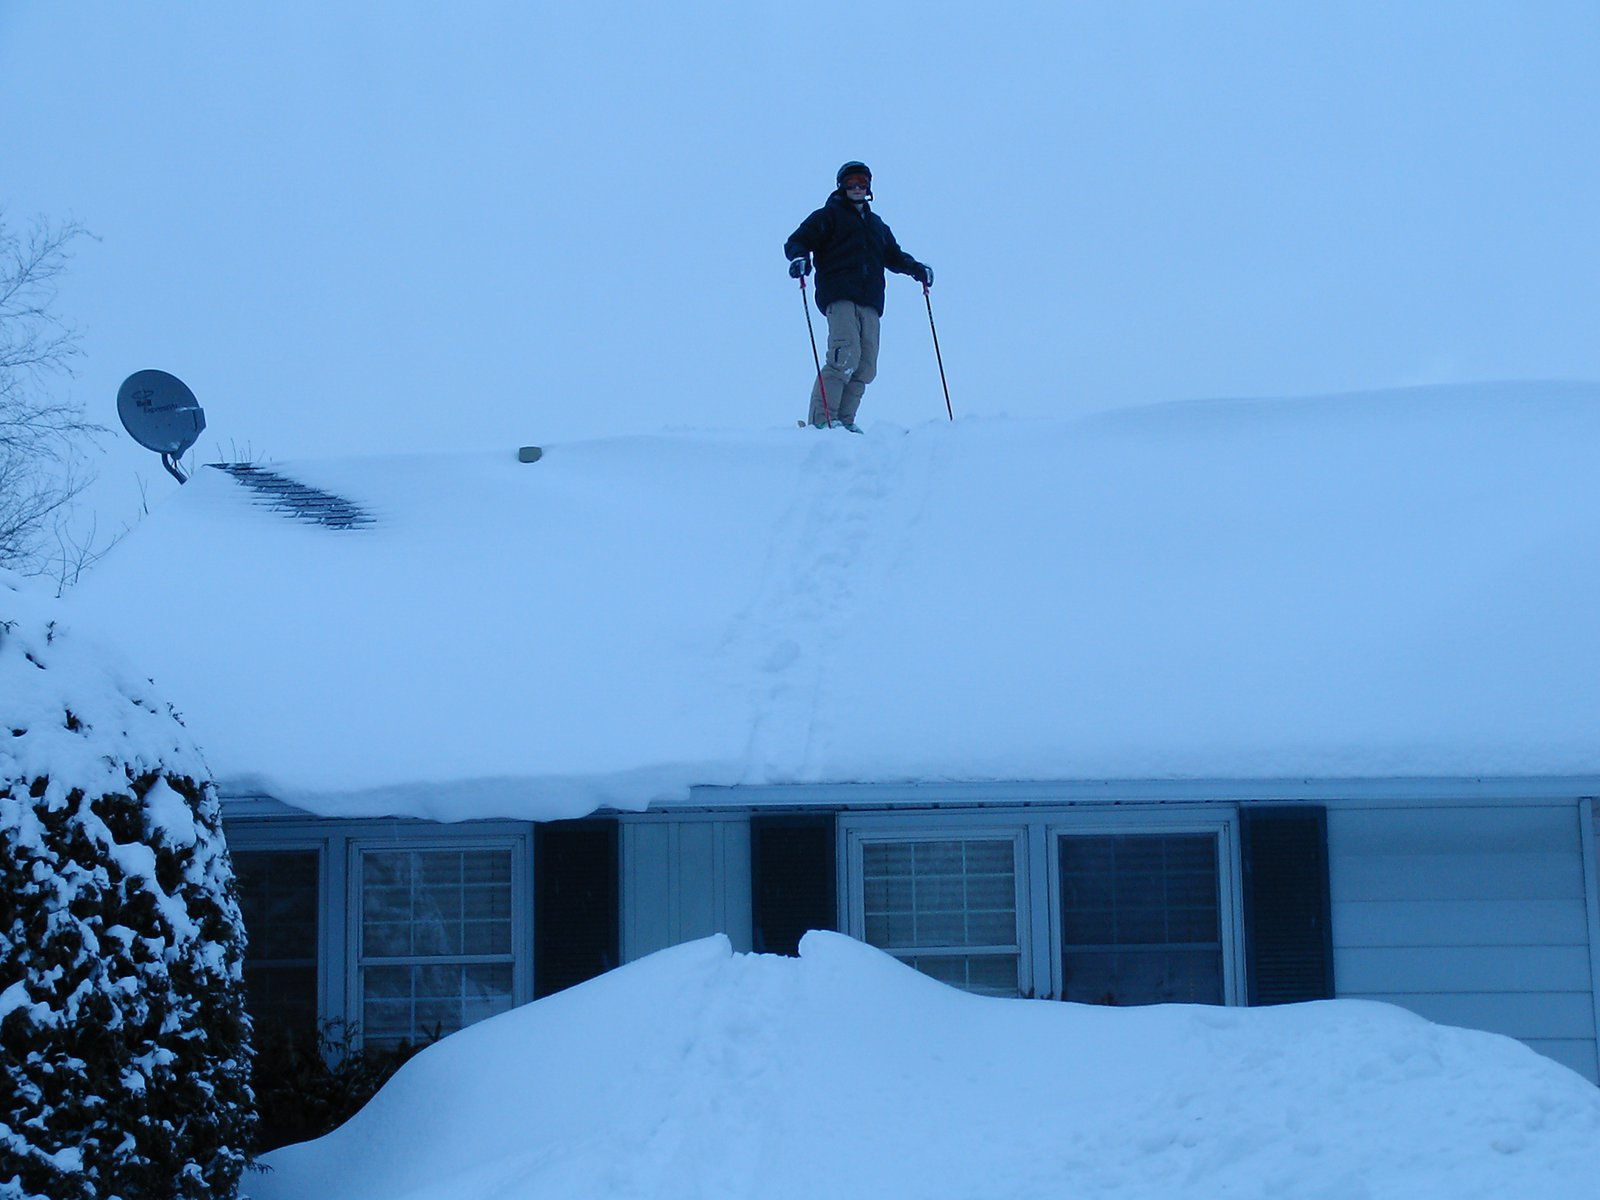 No ski hill + lotsa snow = roof skiing